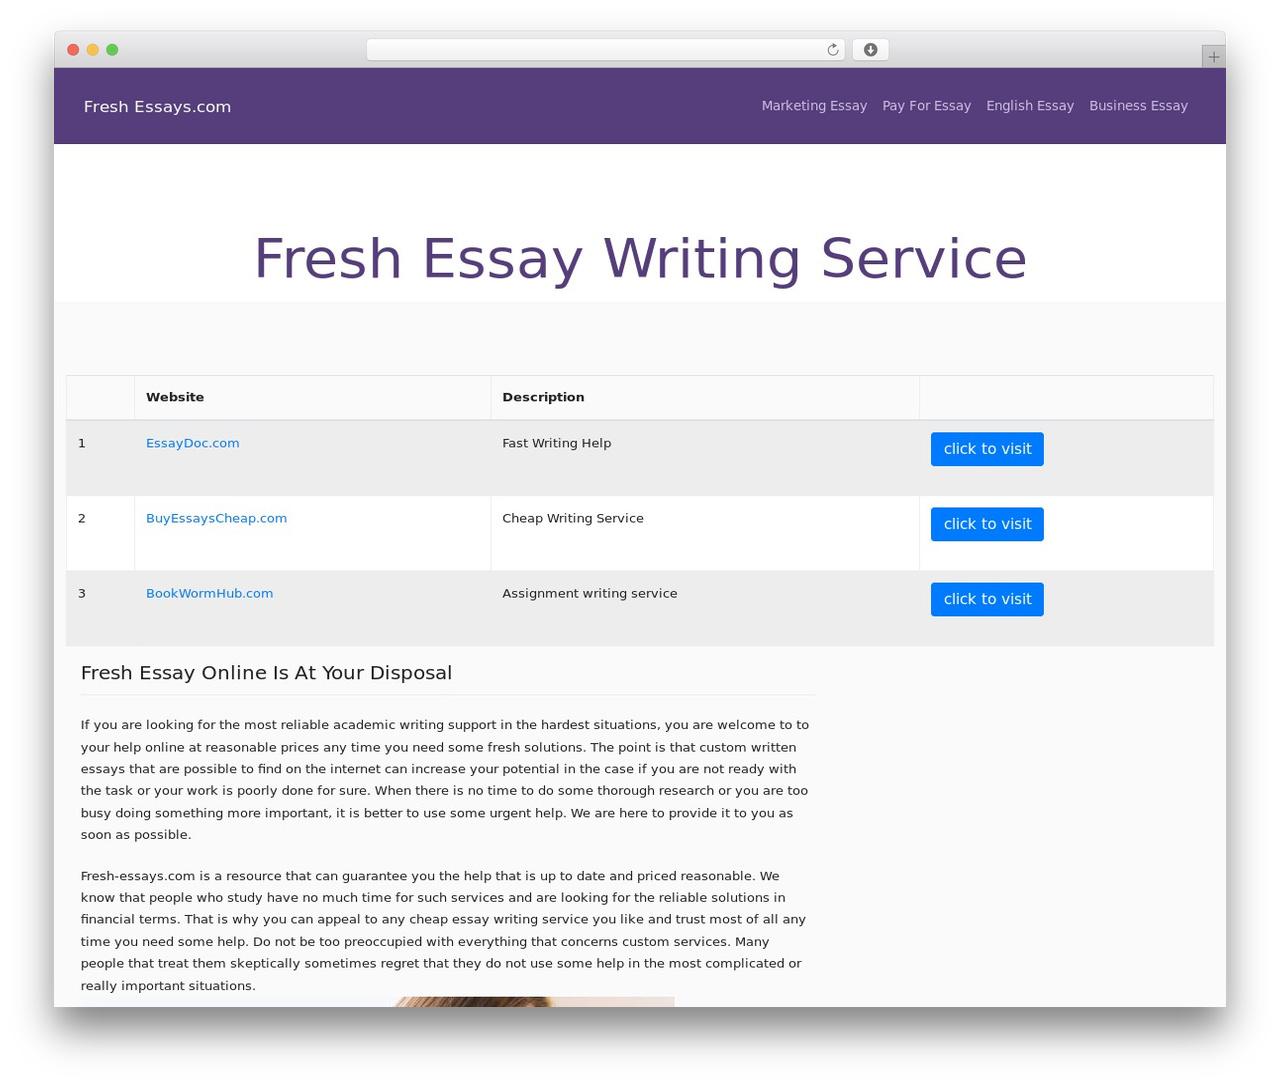 010 Material Design Wp Best Free Wordpress Theme 7cr4 O Fresh Essays Essay Wondrous Contact Customer Service Number Full